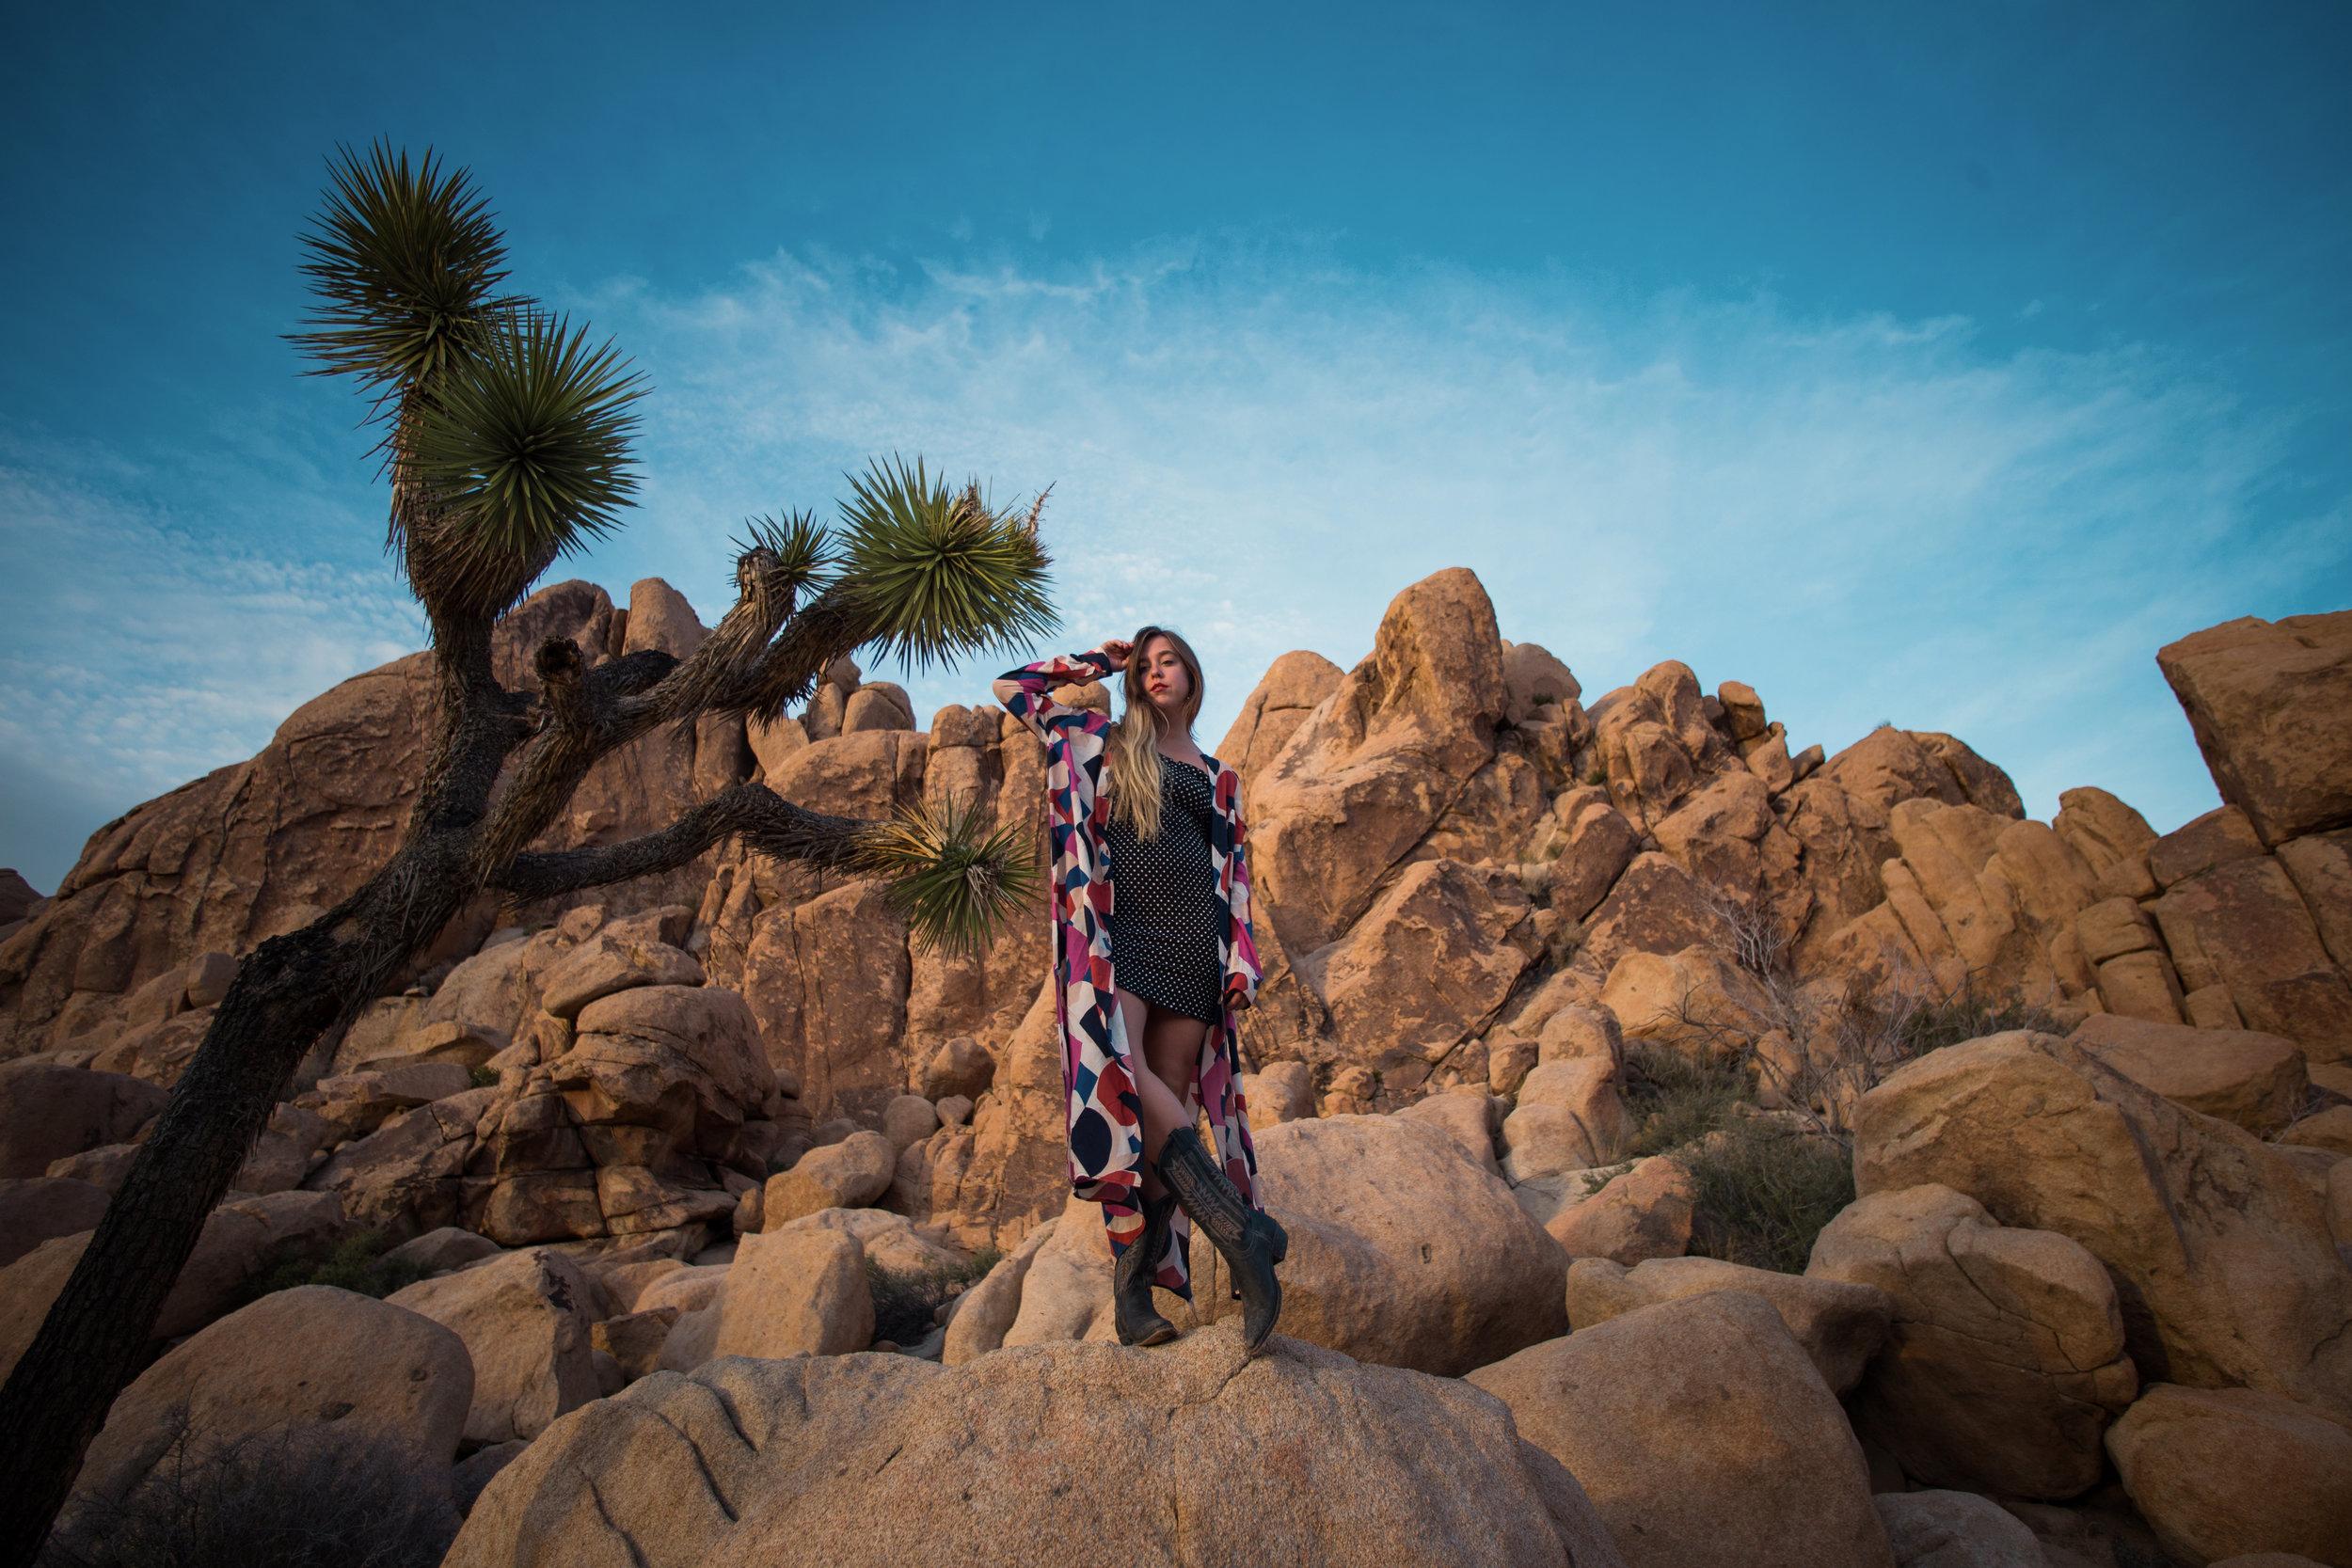 AstroBandit_JordanRose_GoJane_FreePeople_CowboyBoots_FarylRobin_Desert_Sunset_Spring_2018_MixingPrints_7.jpg